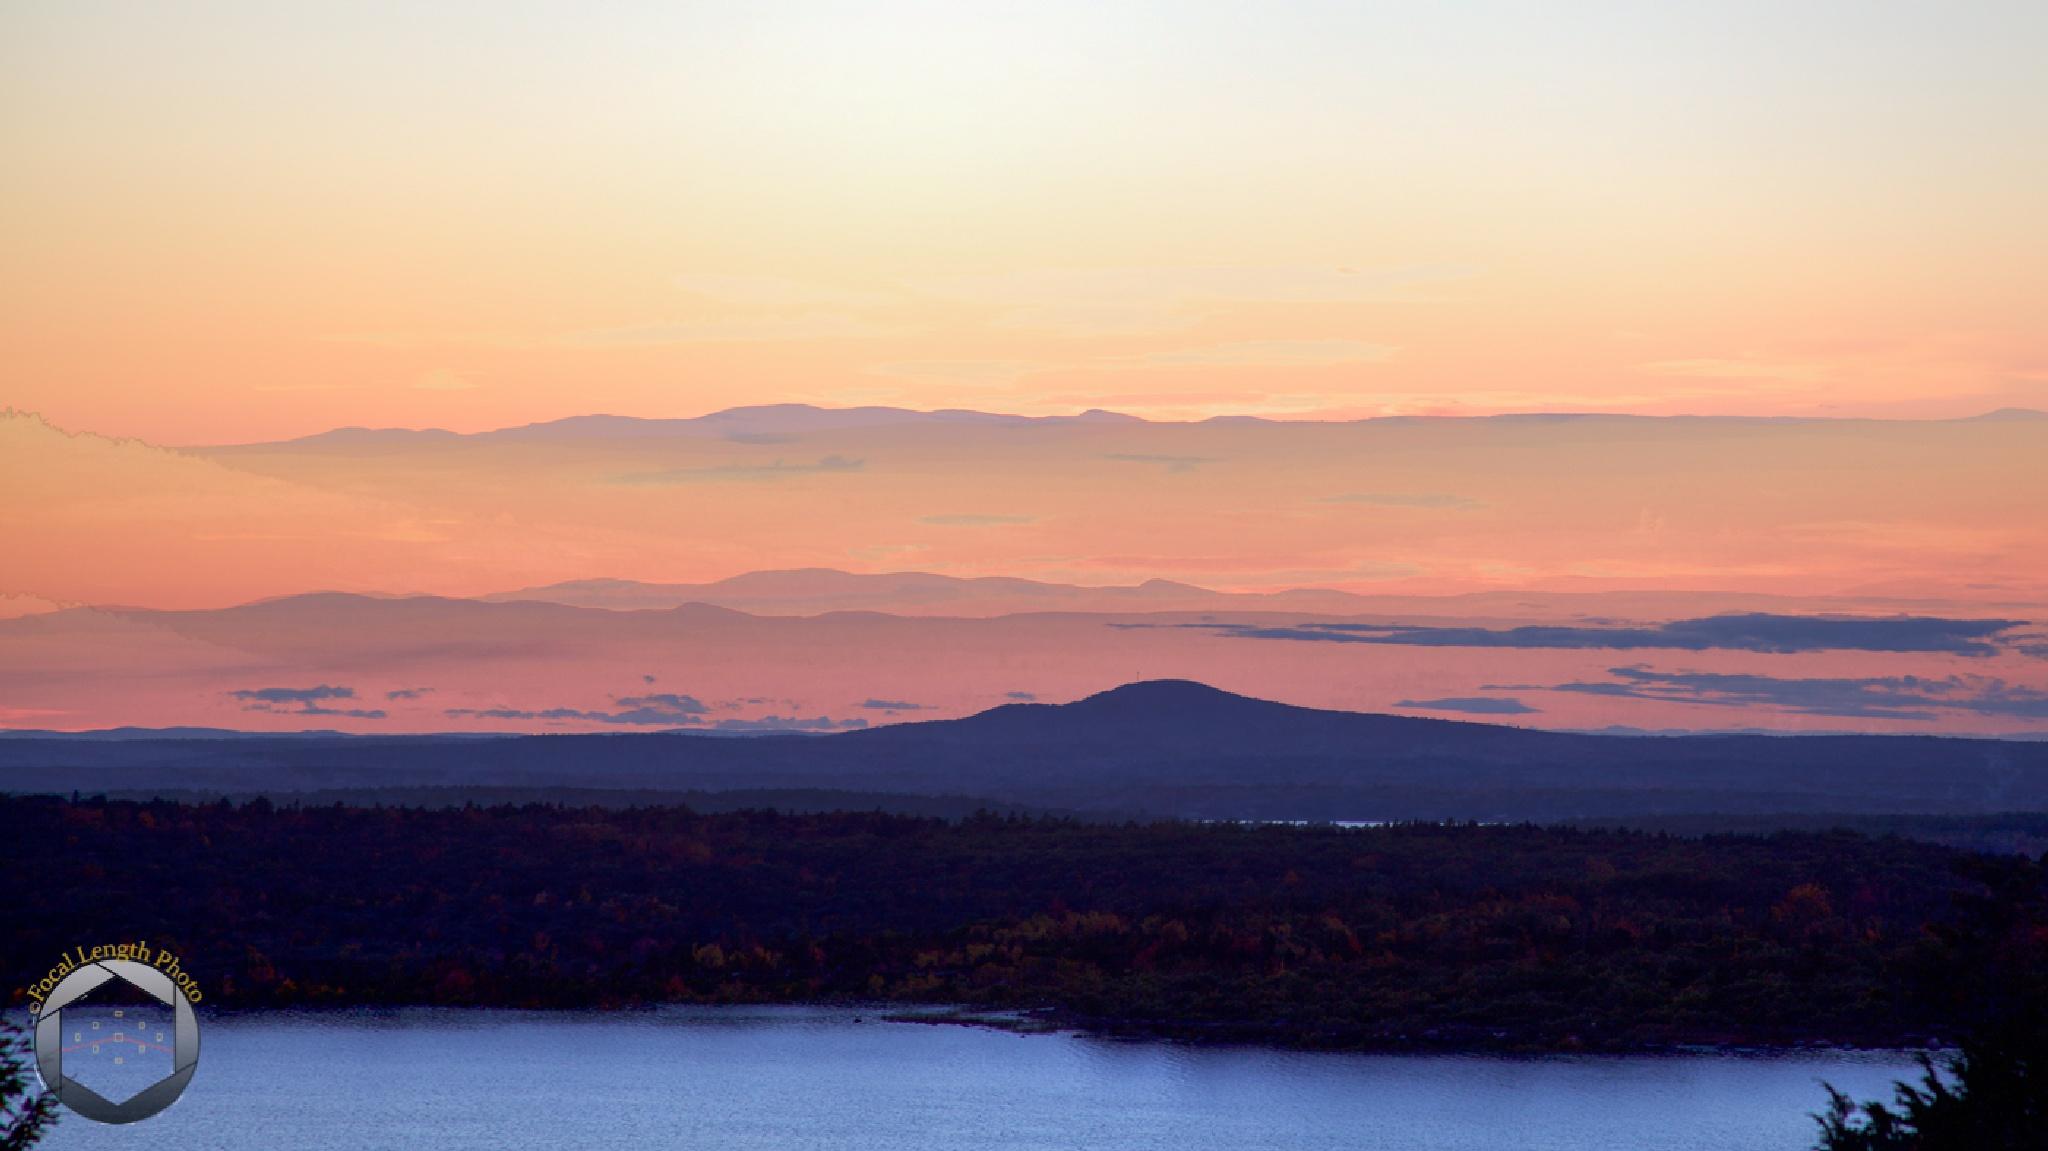 Eagle Pond Sunset - Acadia National Park by jbrissettephoto